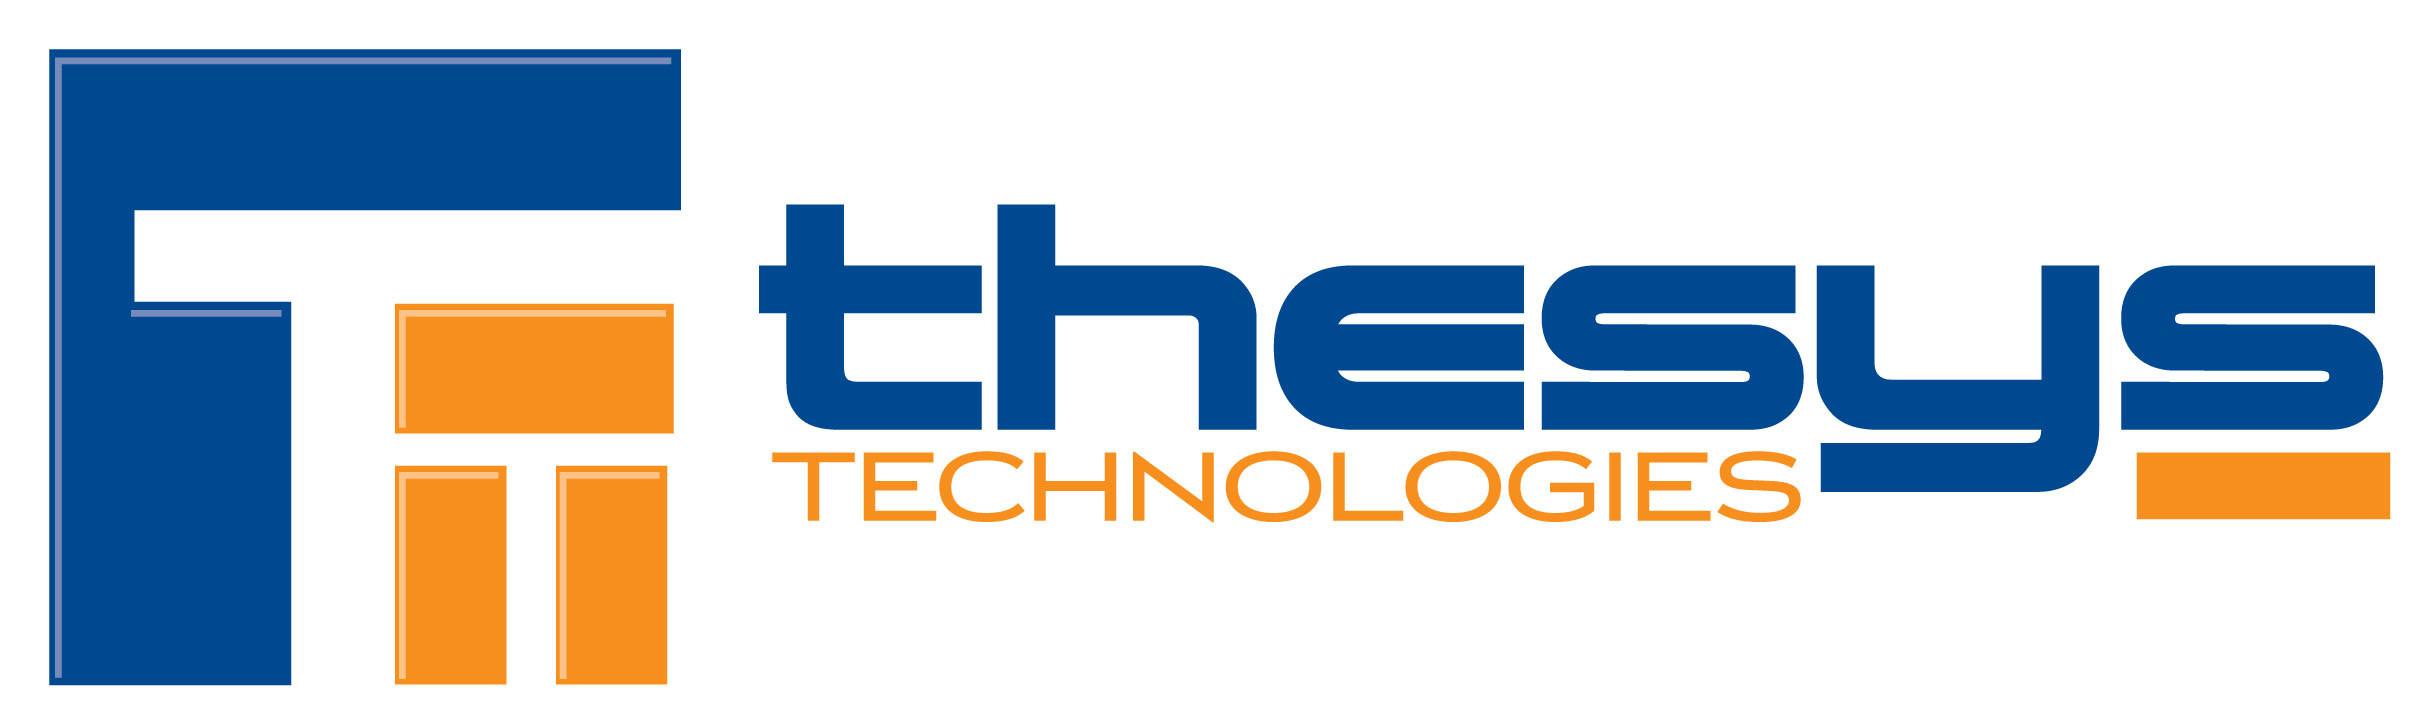 Thesys Technologies, LLC (PRNewsfoto/Thesys Technologies, LLC)